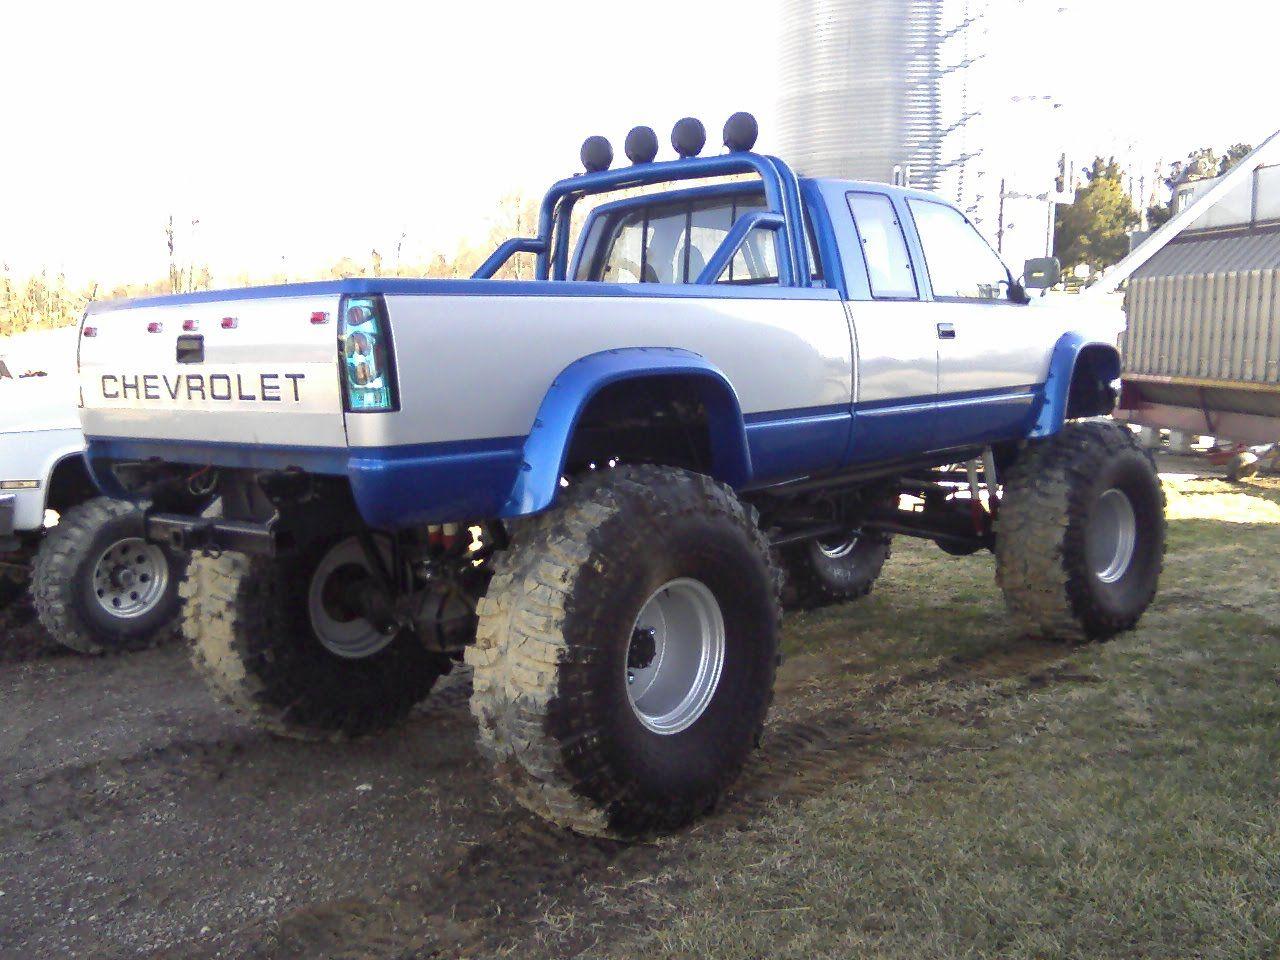 Lifted Silverado Mud Truck With Kc Lights Truck Yeaaah